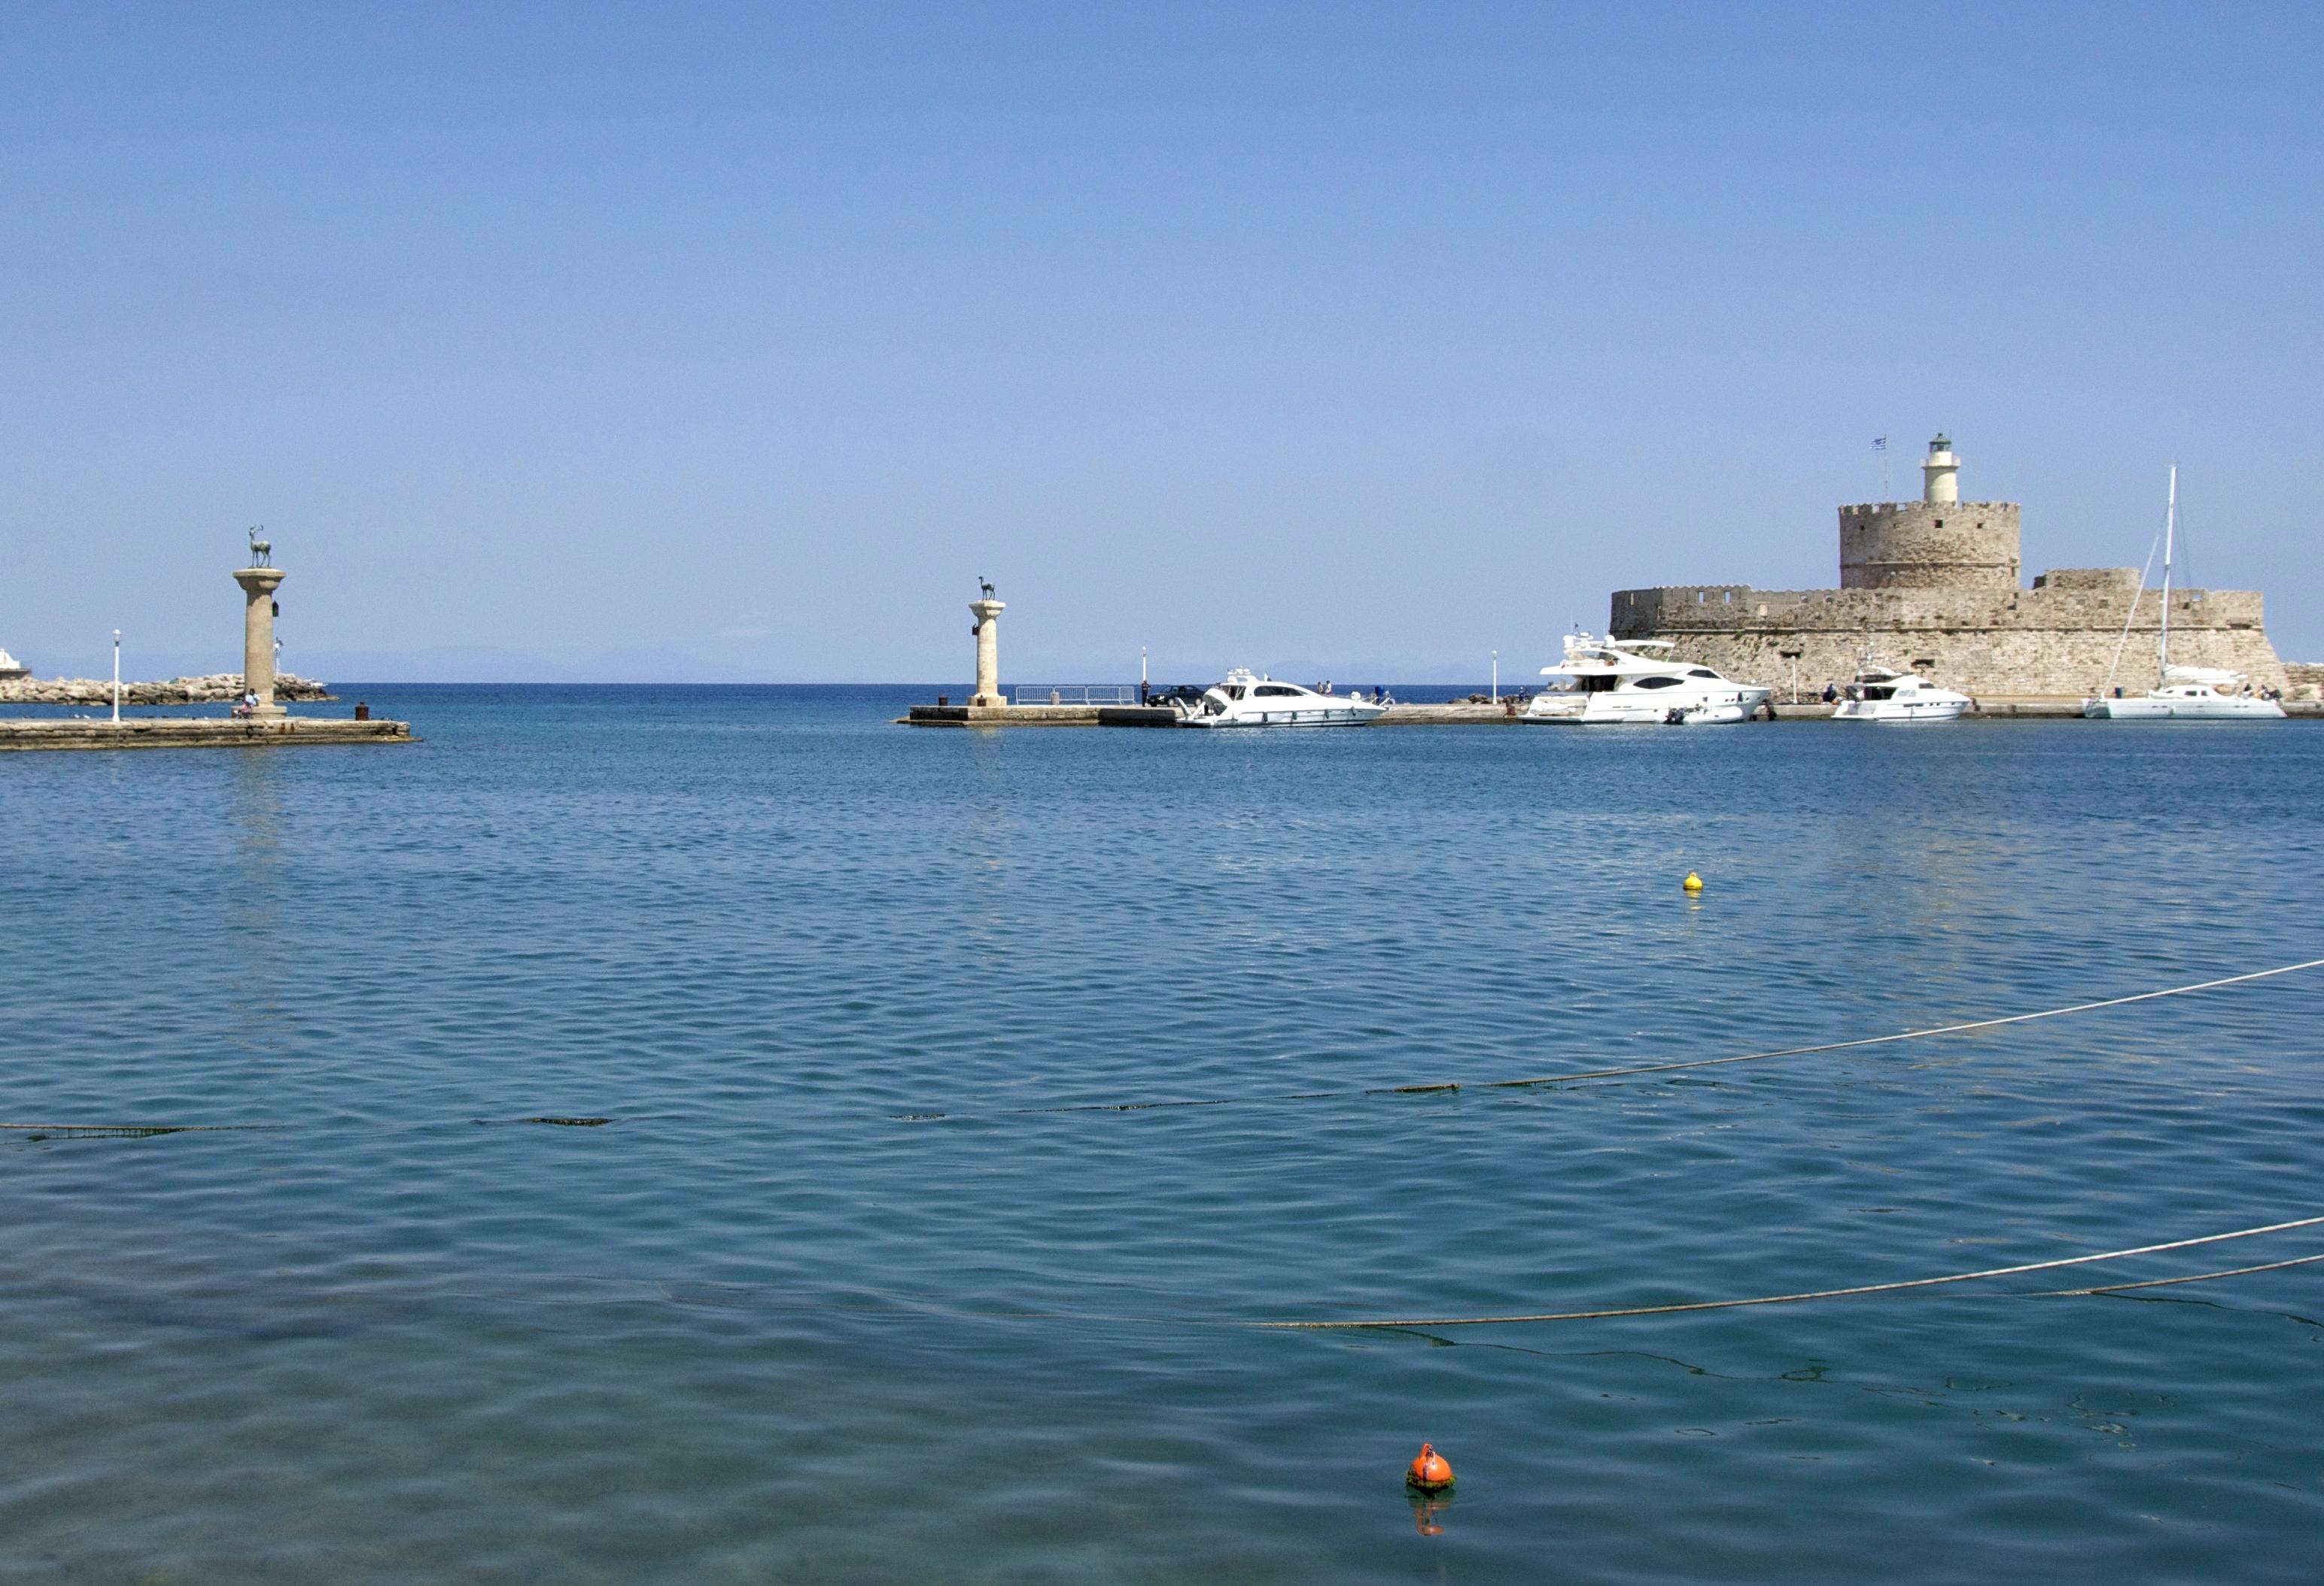 File:Mandraki colosseus harbour rhodes.jpg